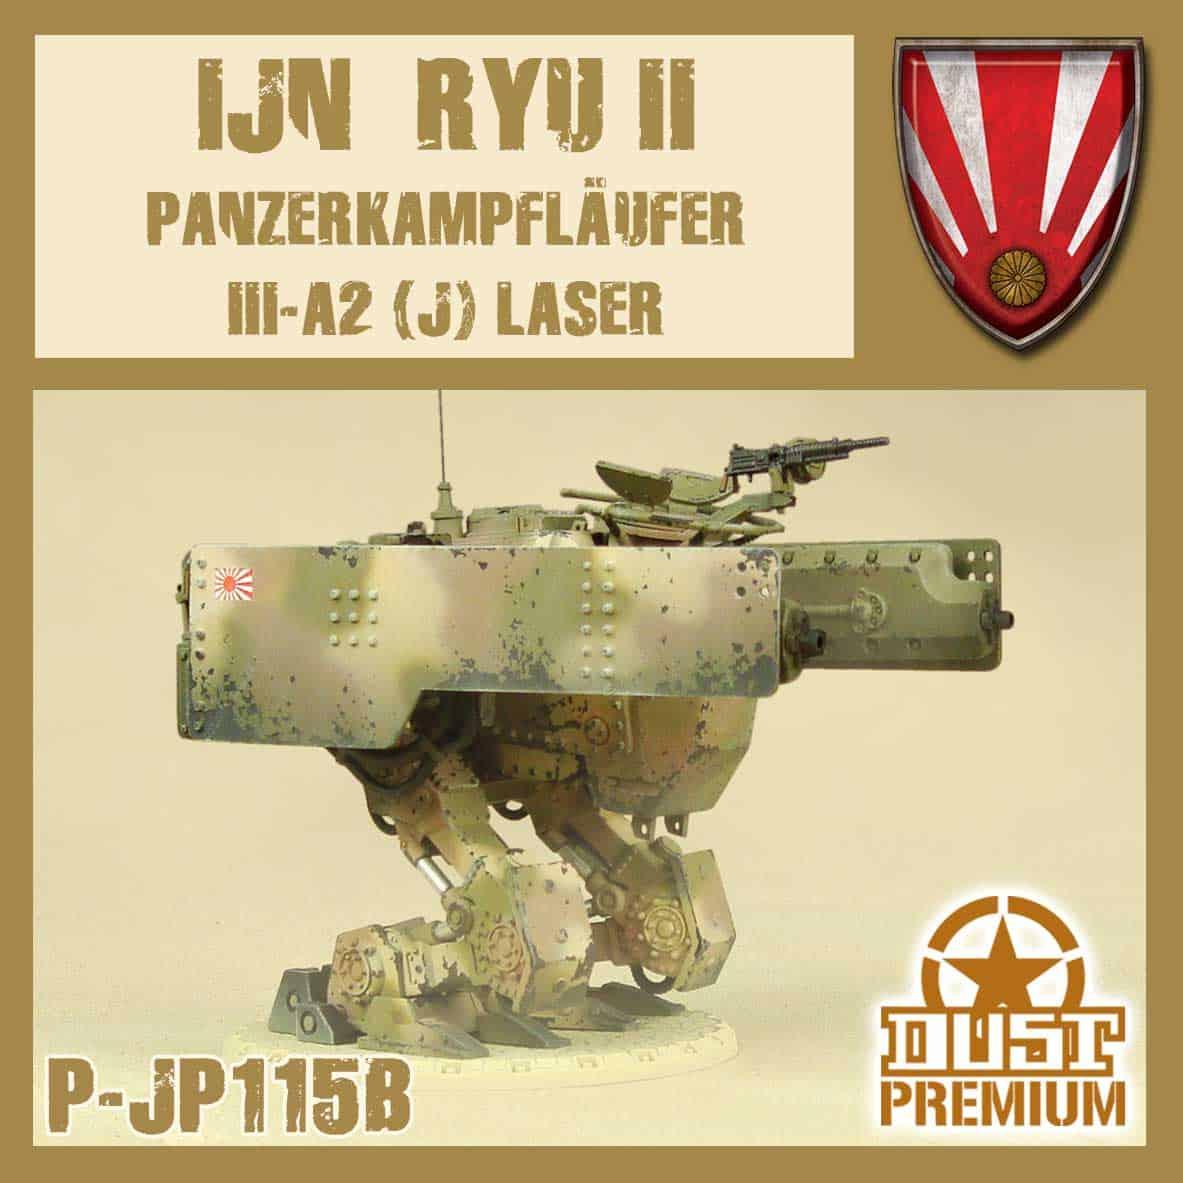 Ryu II Premium